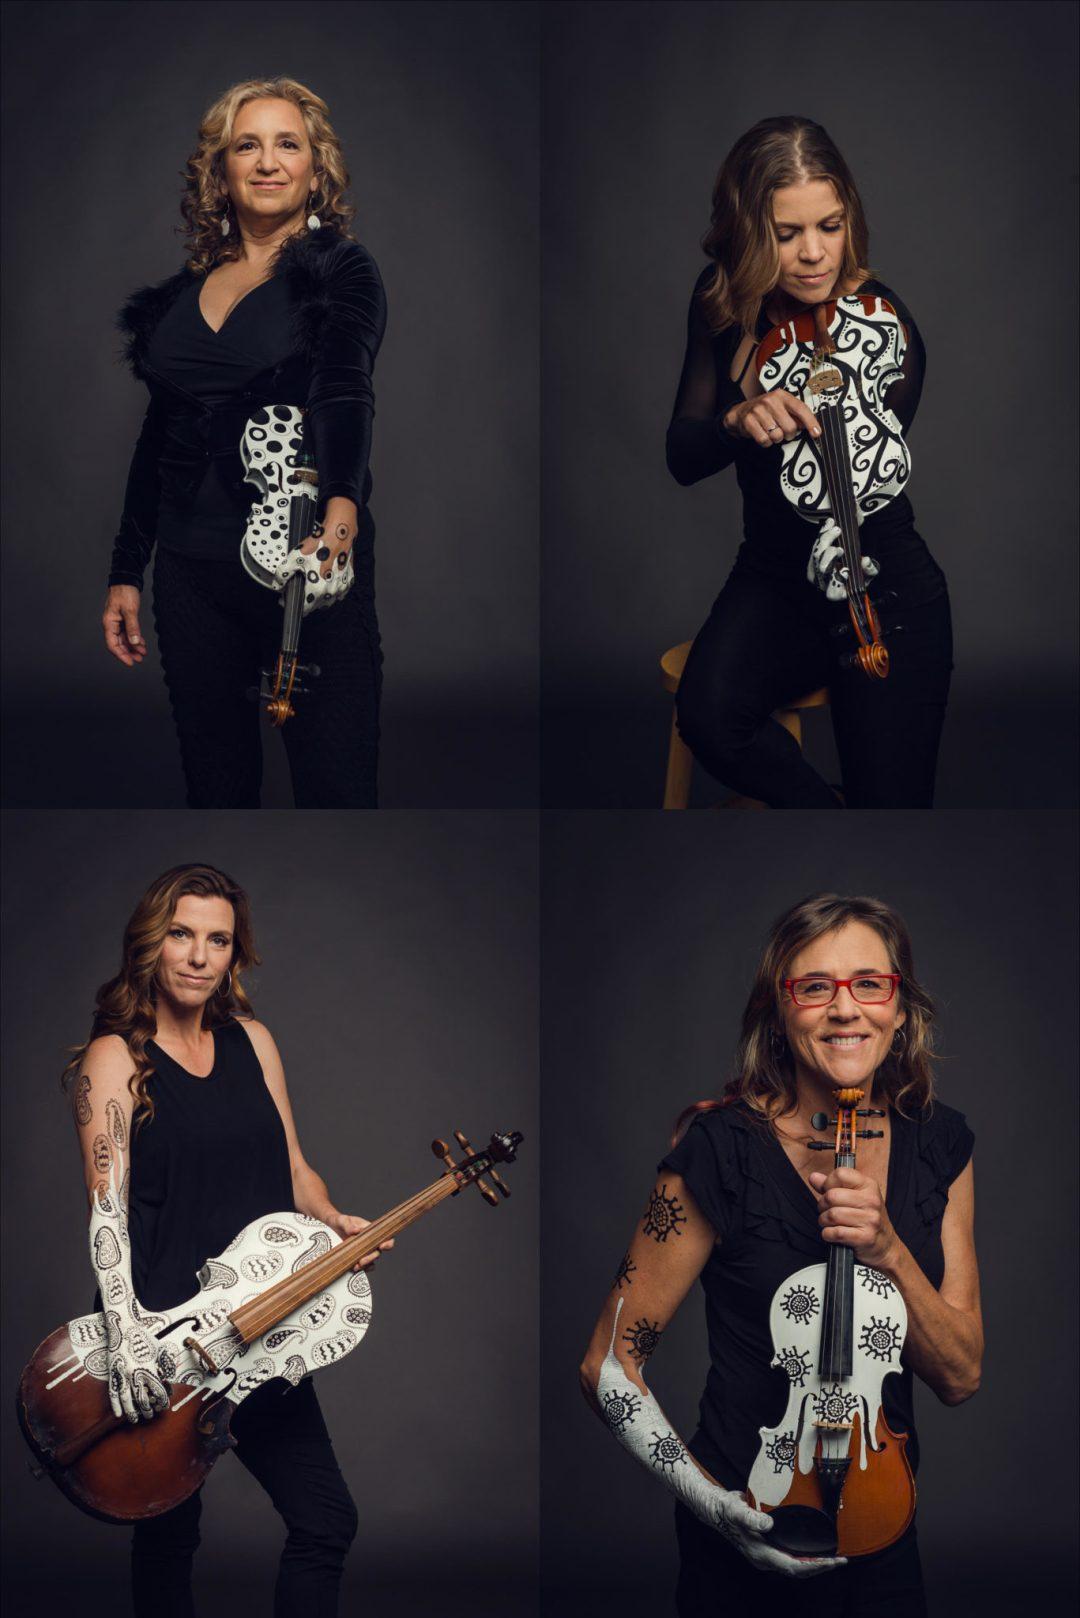 Real_Vocal_String_Quartet(CW-top-left)Irene_Sazer(violin)Darcy_Rindt(viola)Emily_Onderdonk(violin)Vanessa_Ruotolo(cello)Photo-by-Lenny_Gonzalez